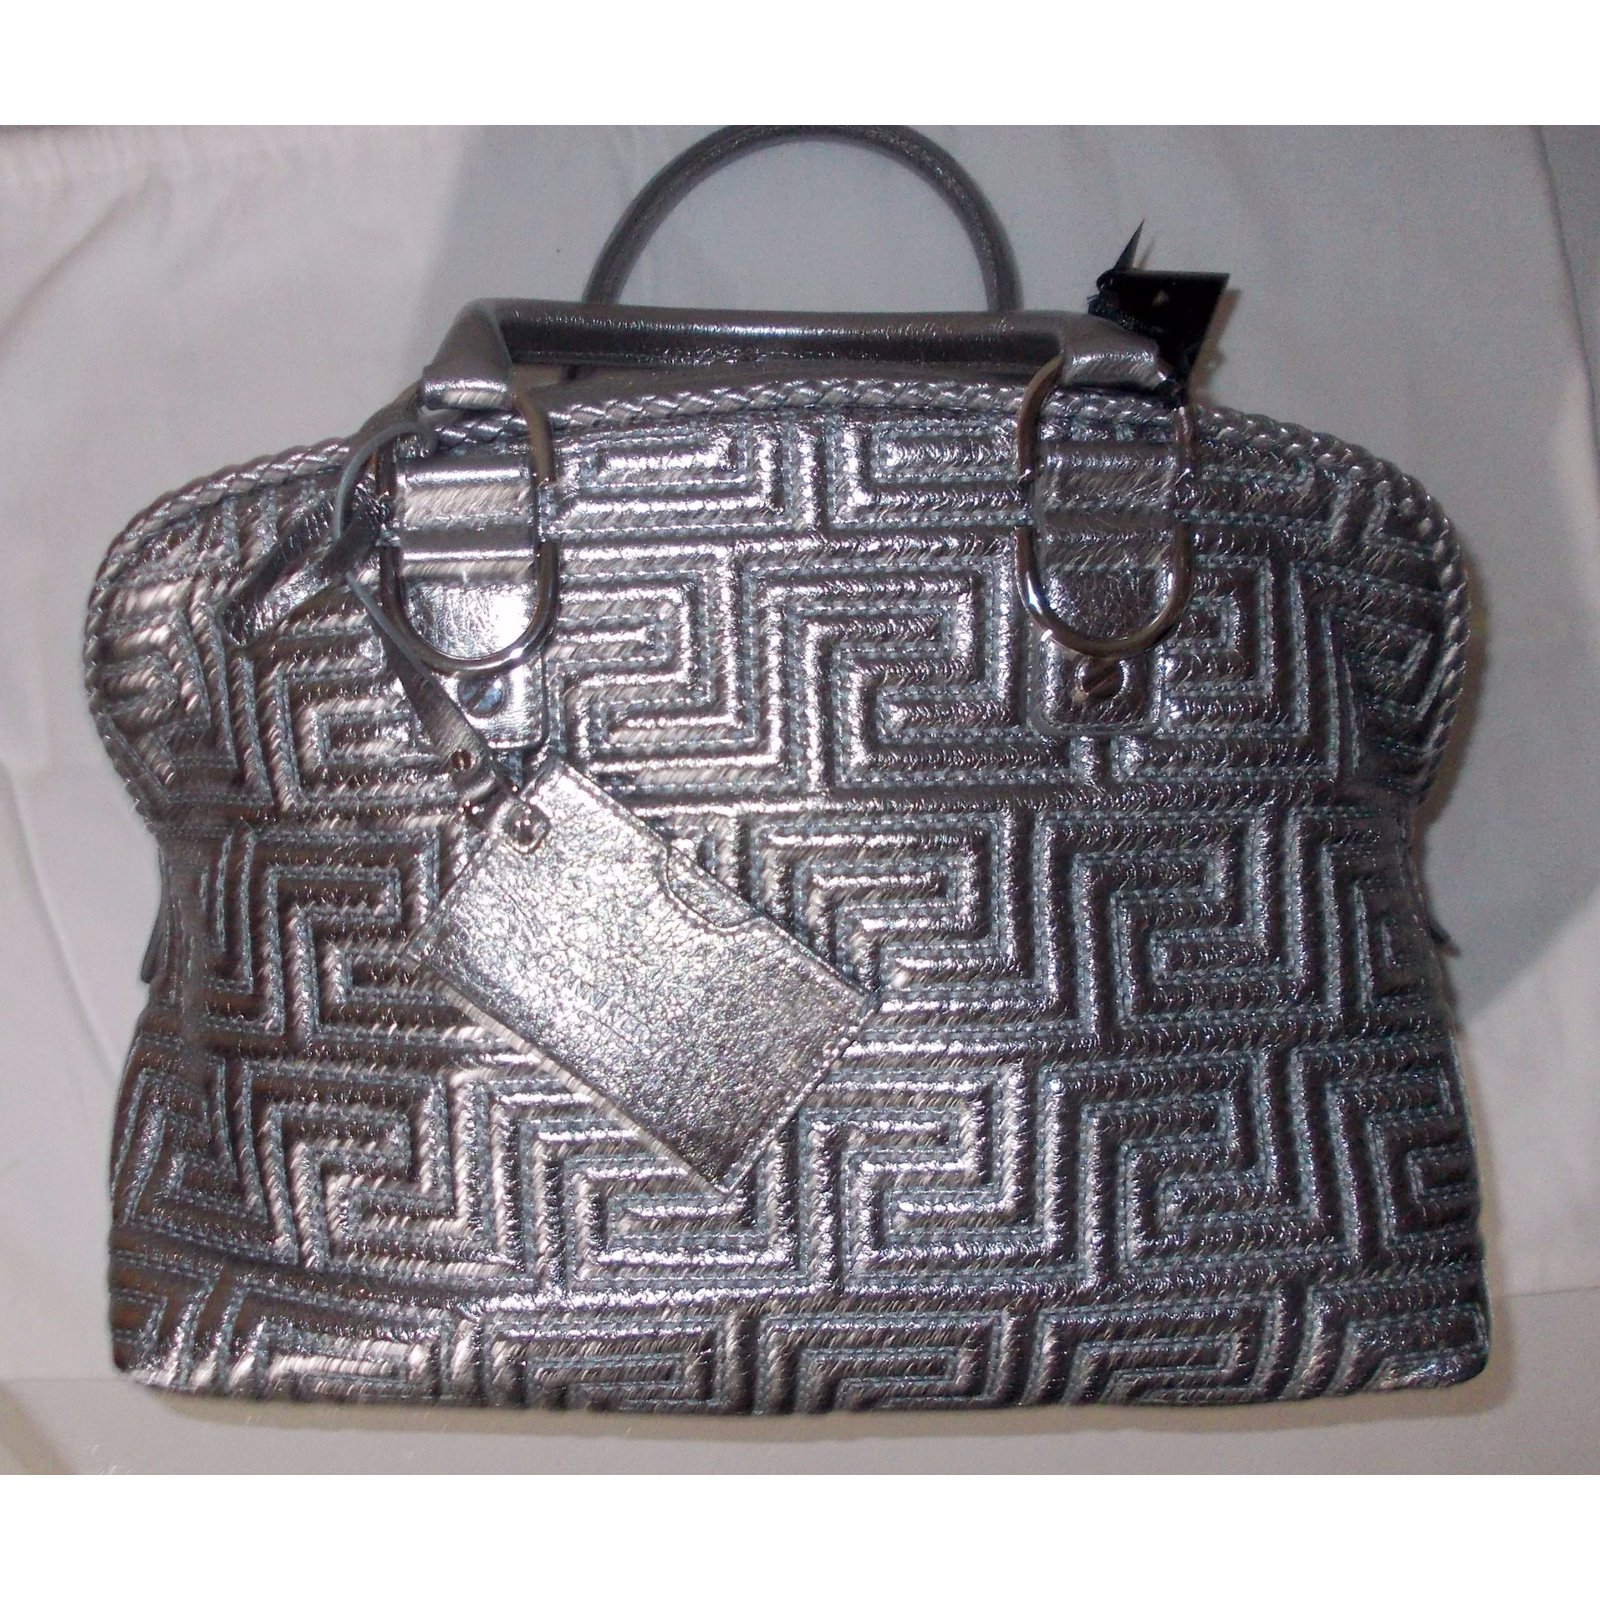 05fe93bd57e0 Gianni versace handbag handbags leather grey metallic ref joli closet jpg  1600x1600 Leather versace bags 2017